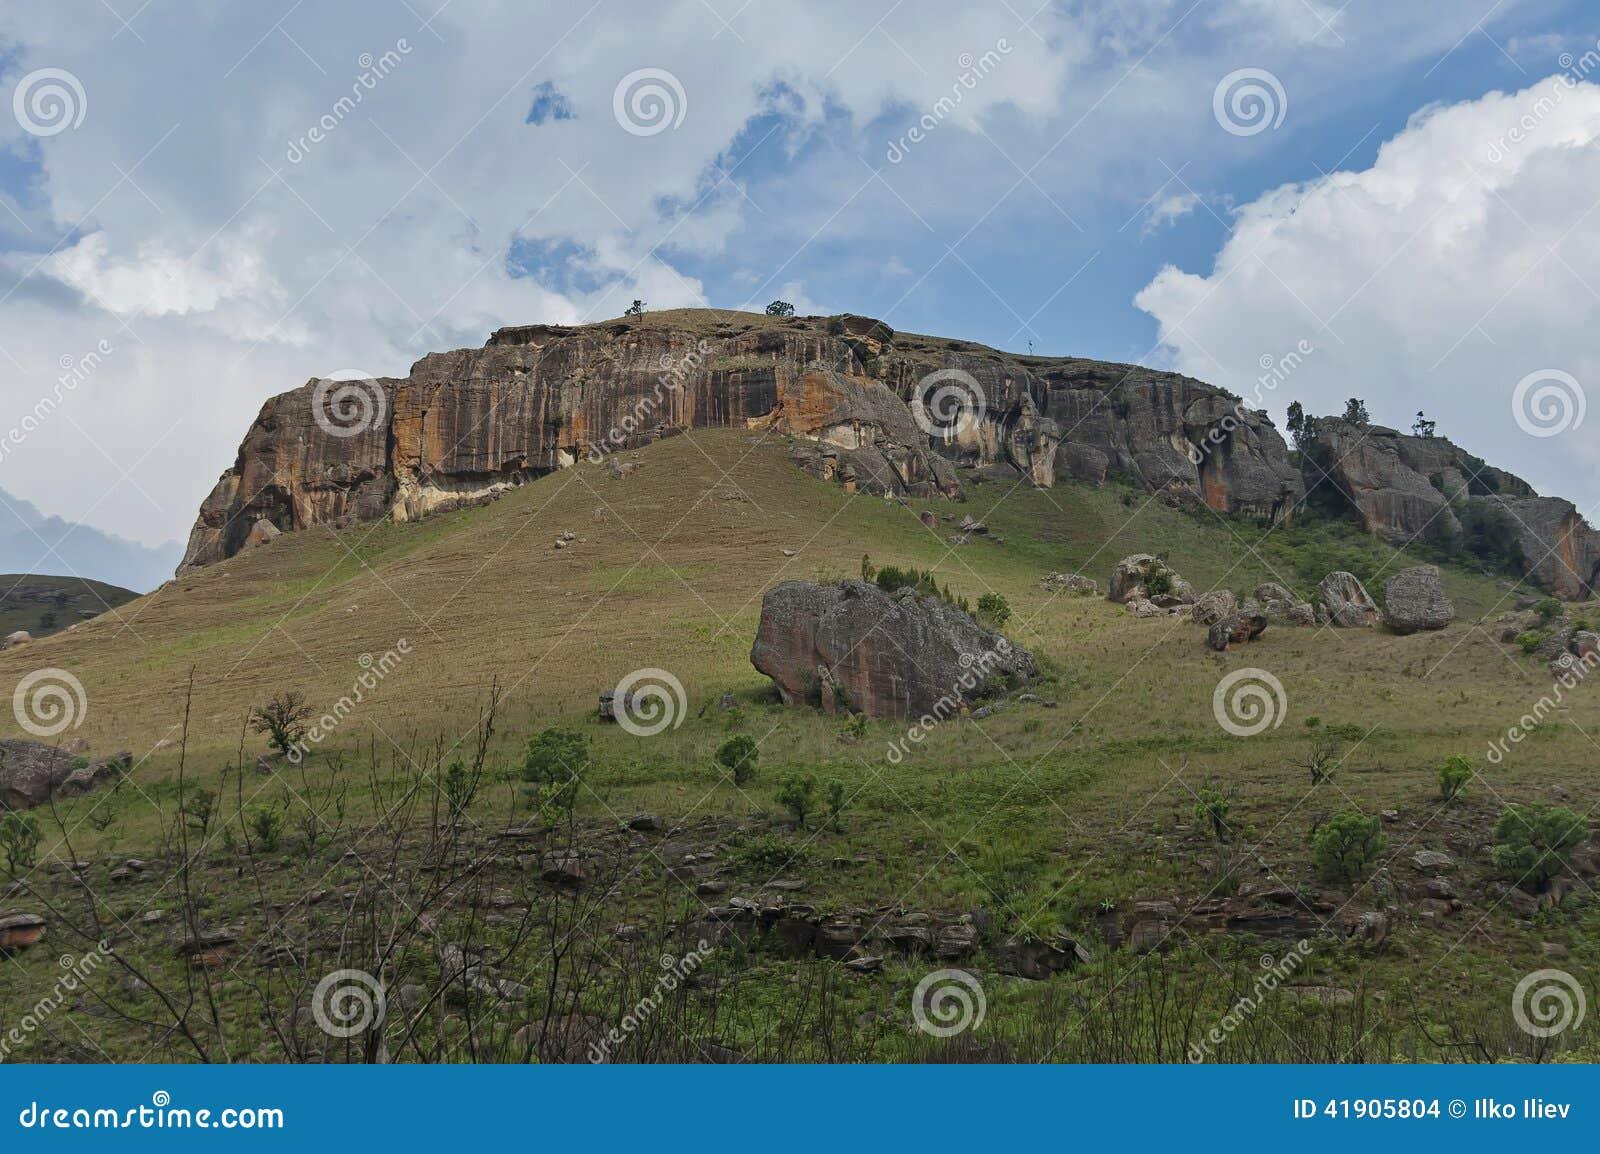 Giants se escuda la reserva de naturaleza de Kwazulu Natal